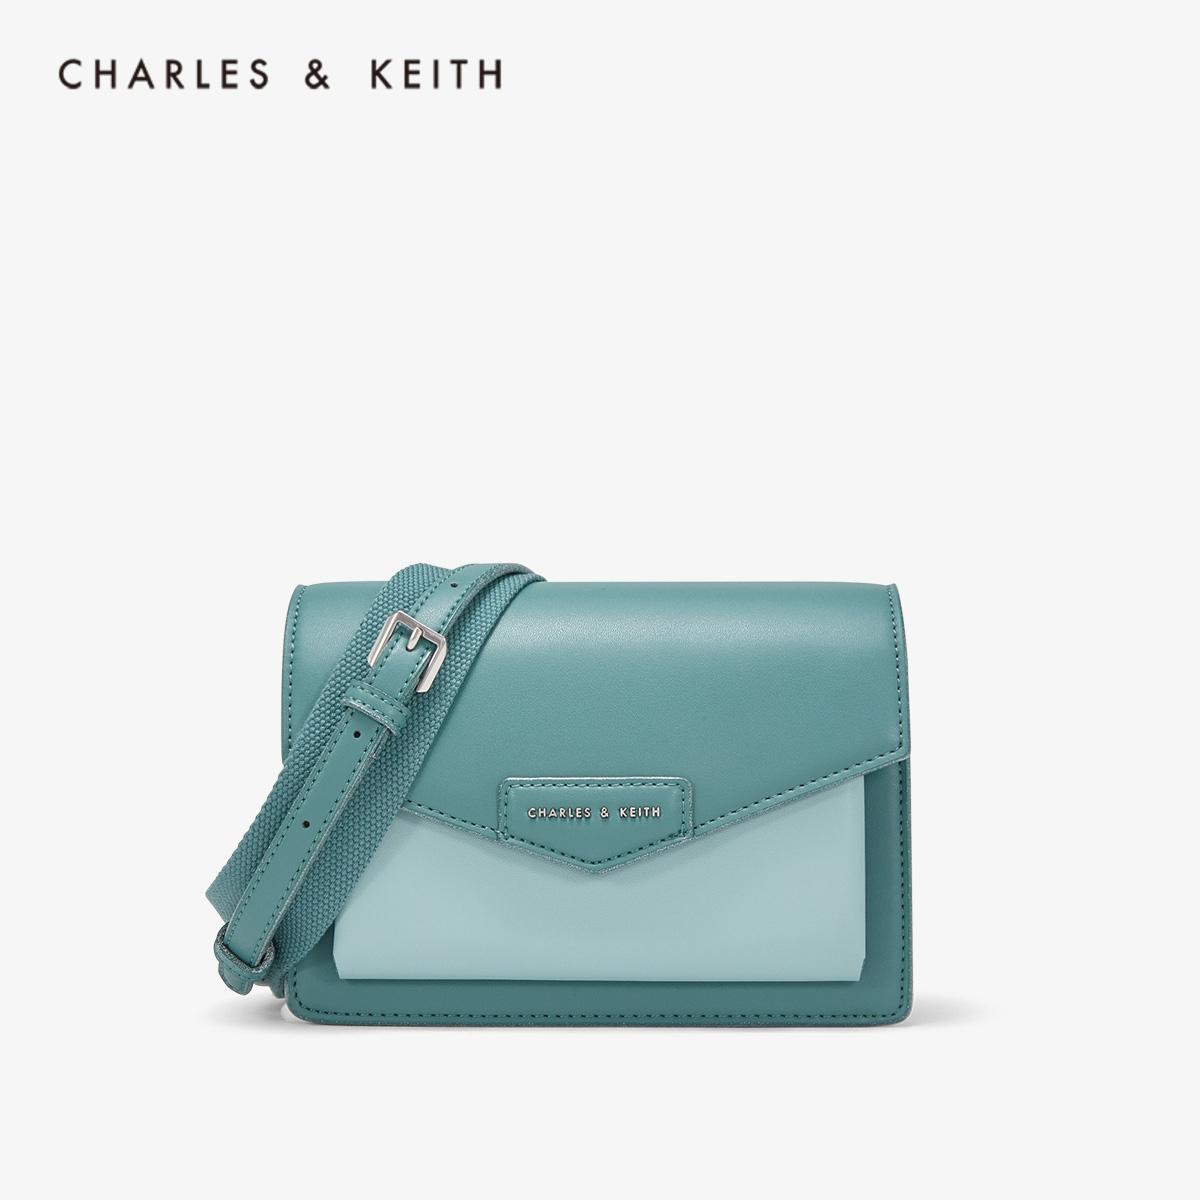 CHARLES&KEITH 信封包 CK2-80680780-1粉蜡通勤女士翻盖单肩包